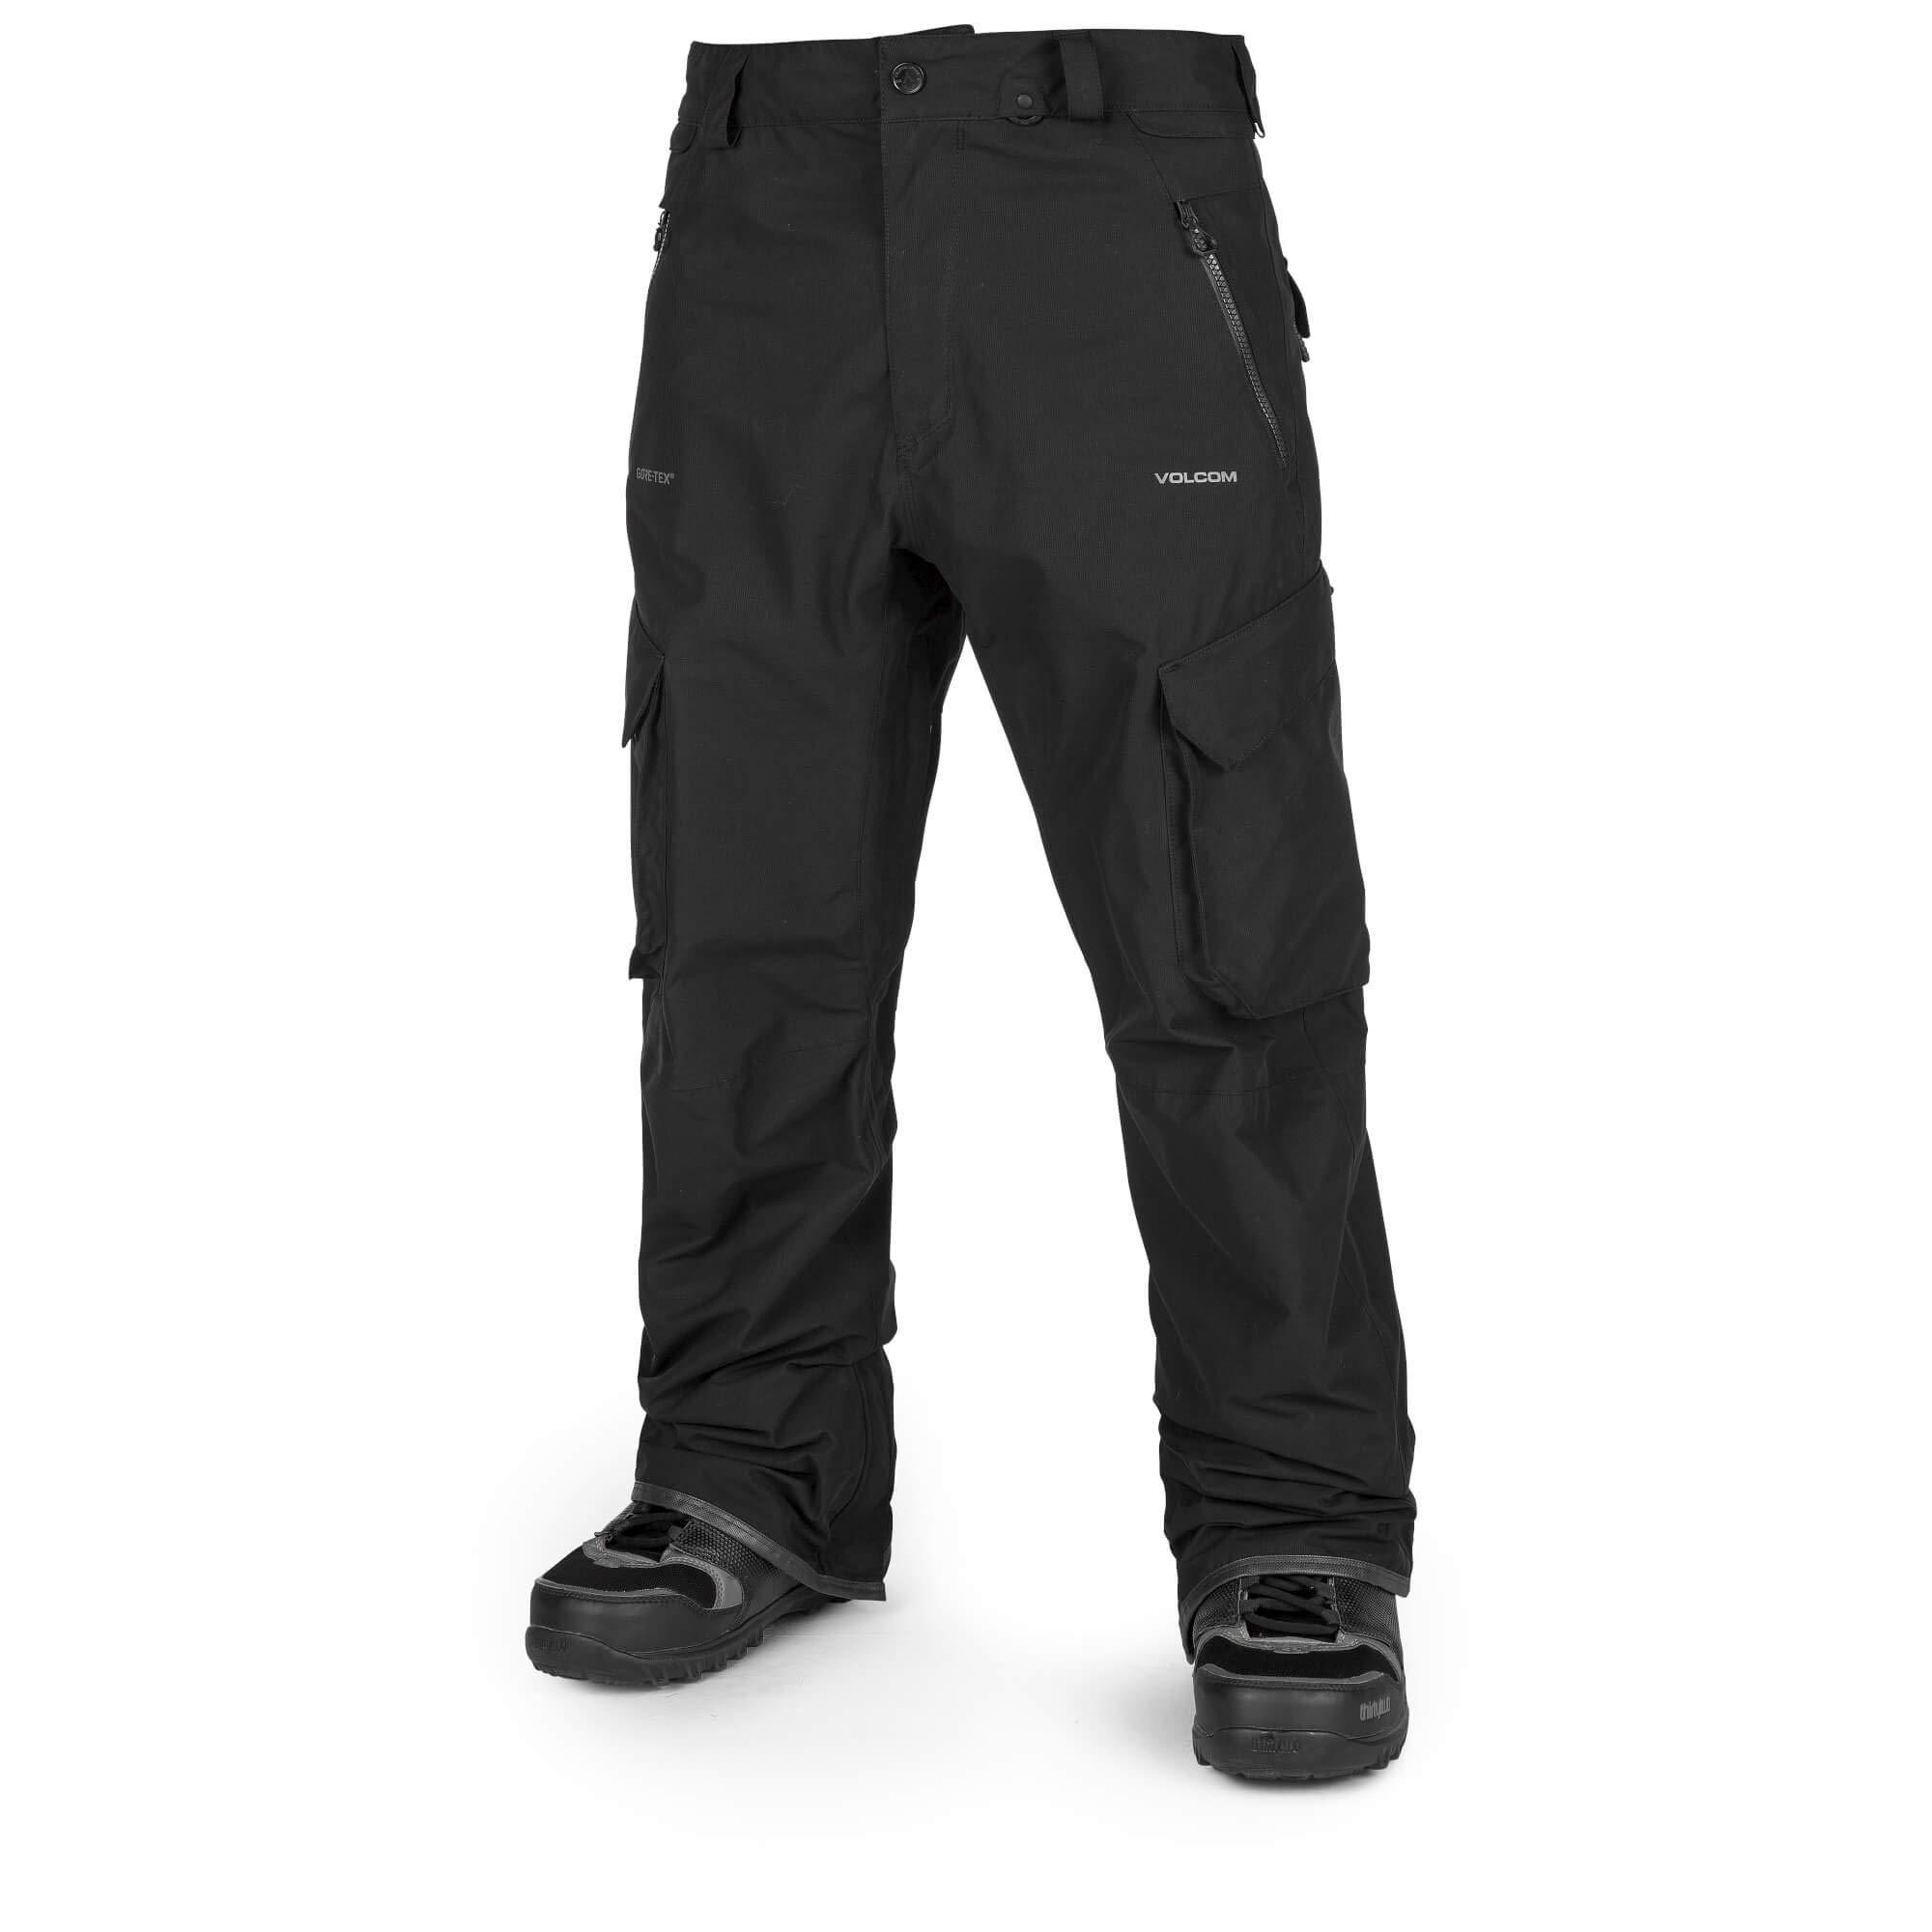 Volcom Men's Lo Gore-Tex Articulated Snow Pant, Black Large